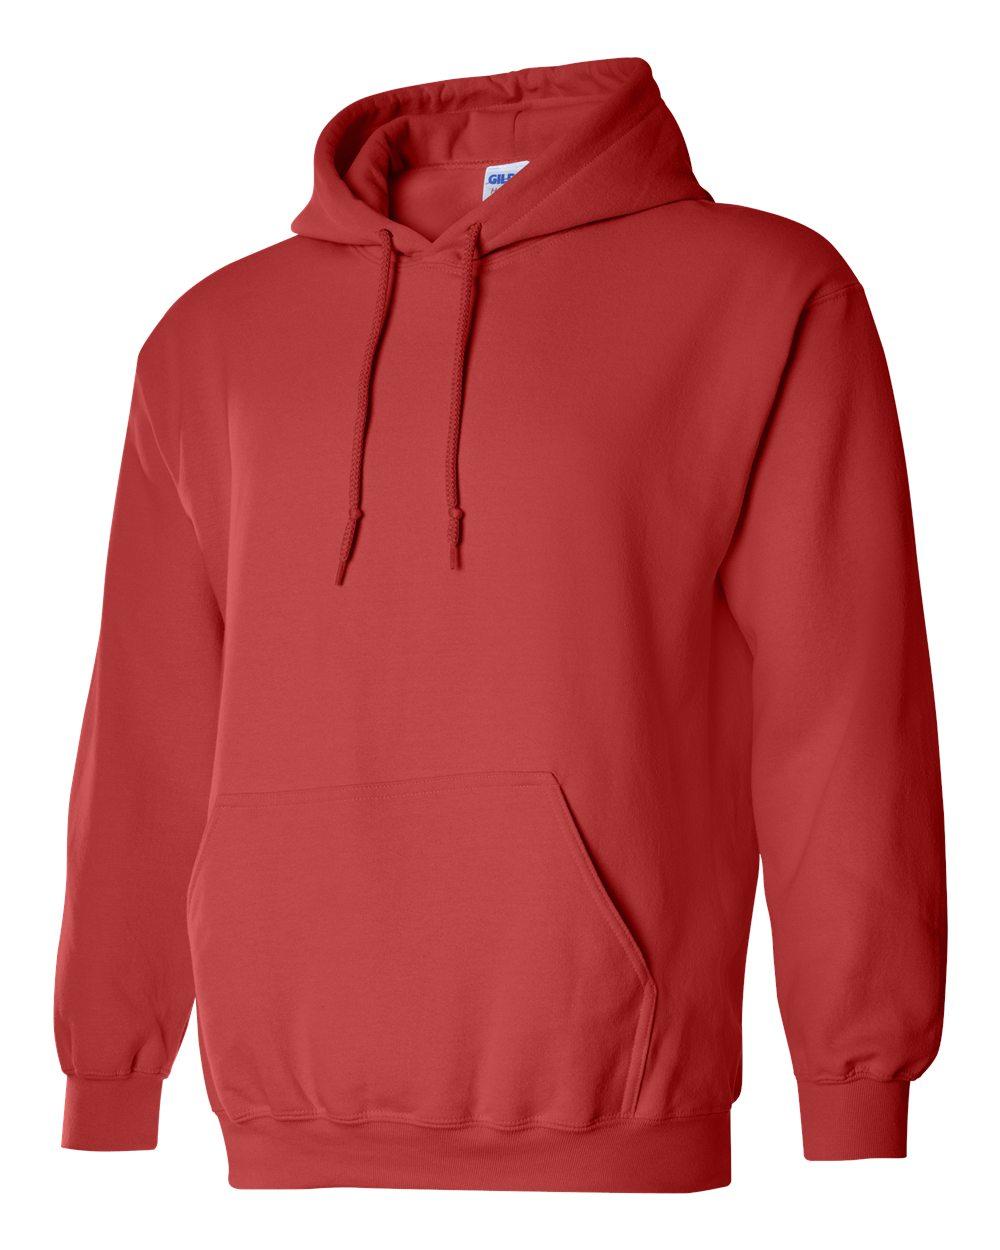 Gildan Heavy Blend Hooded Sweatshirt GI18500 Paprika